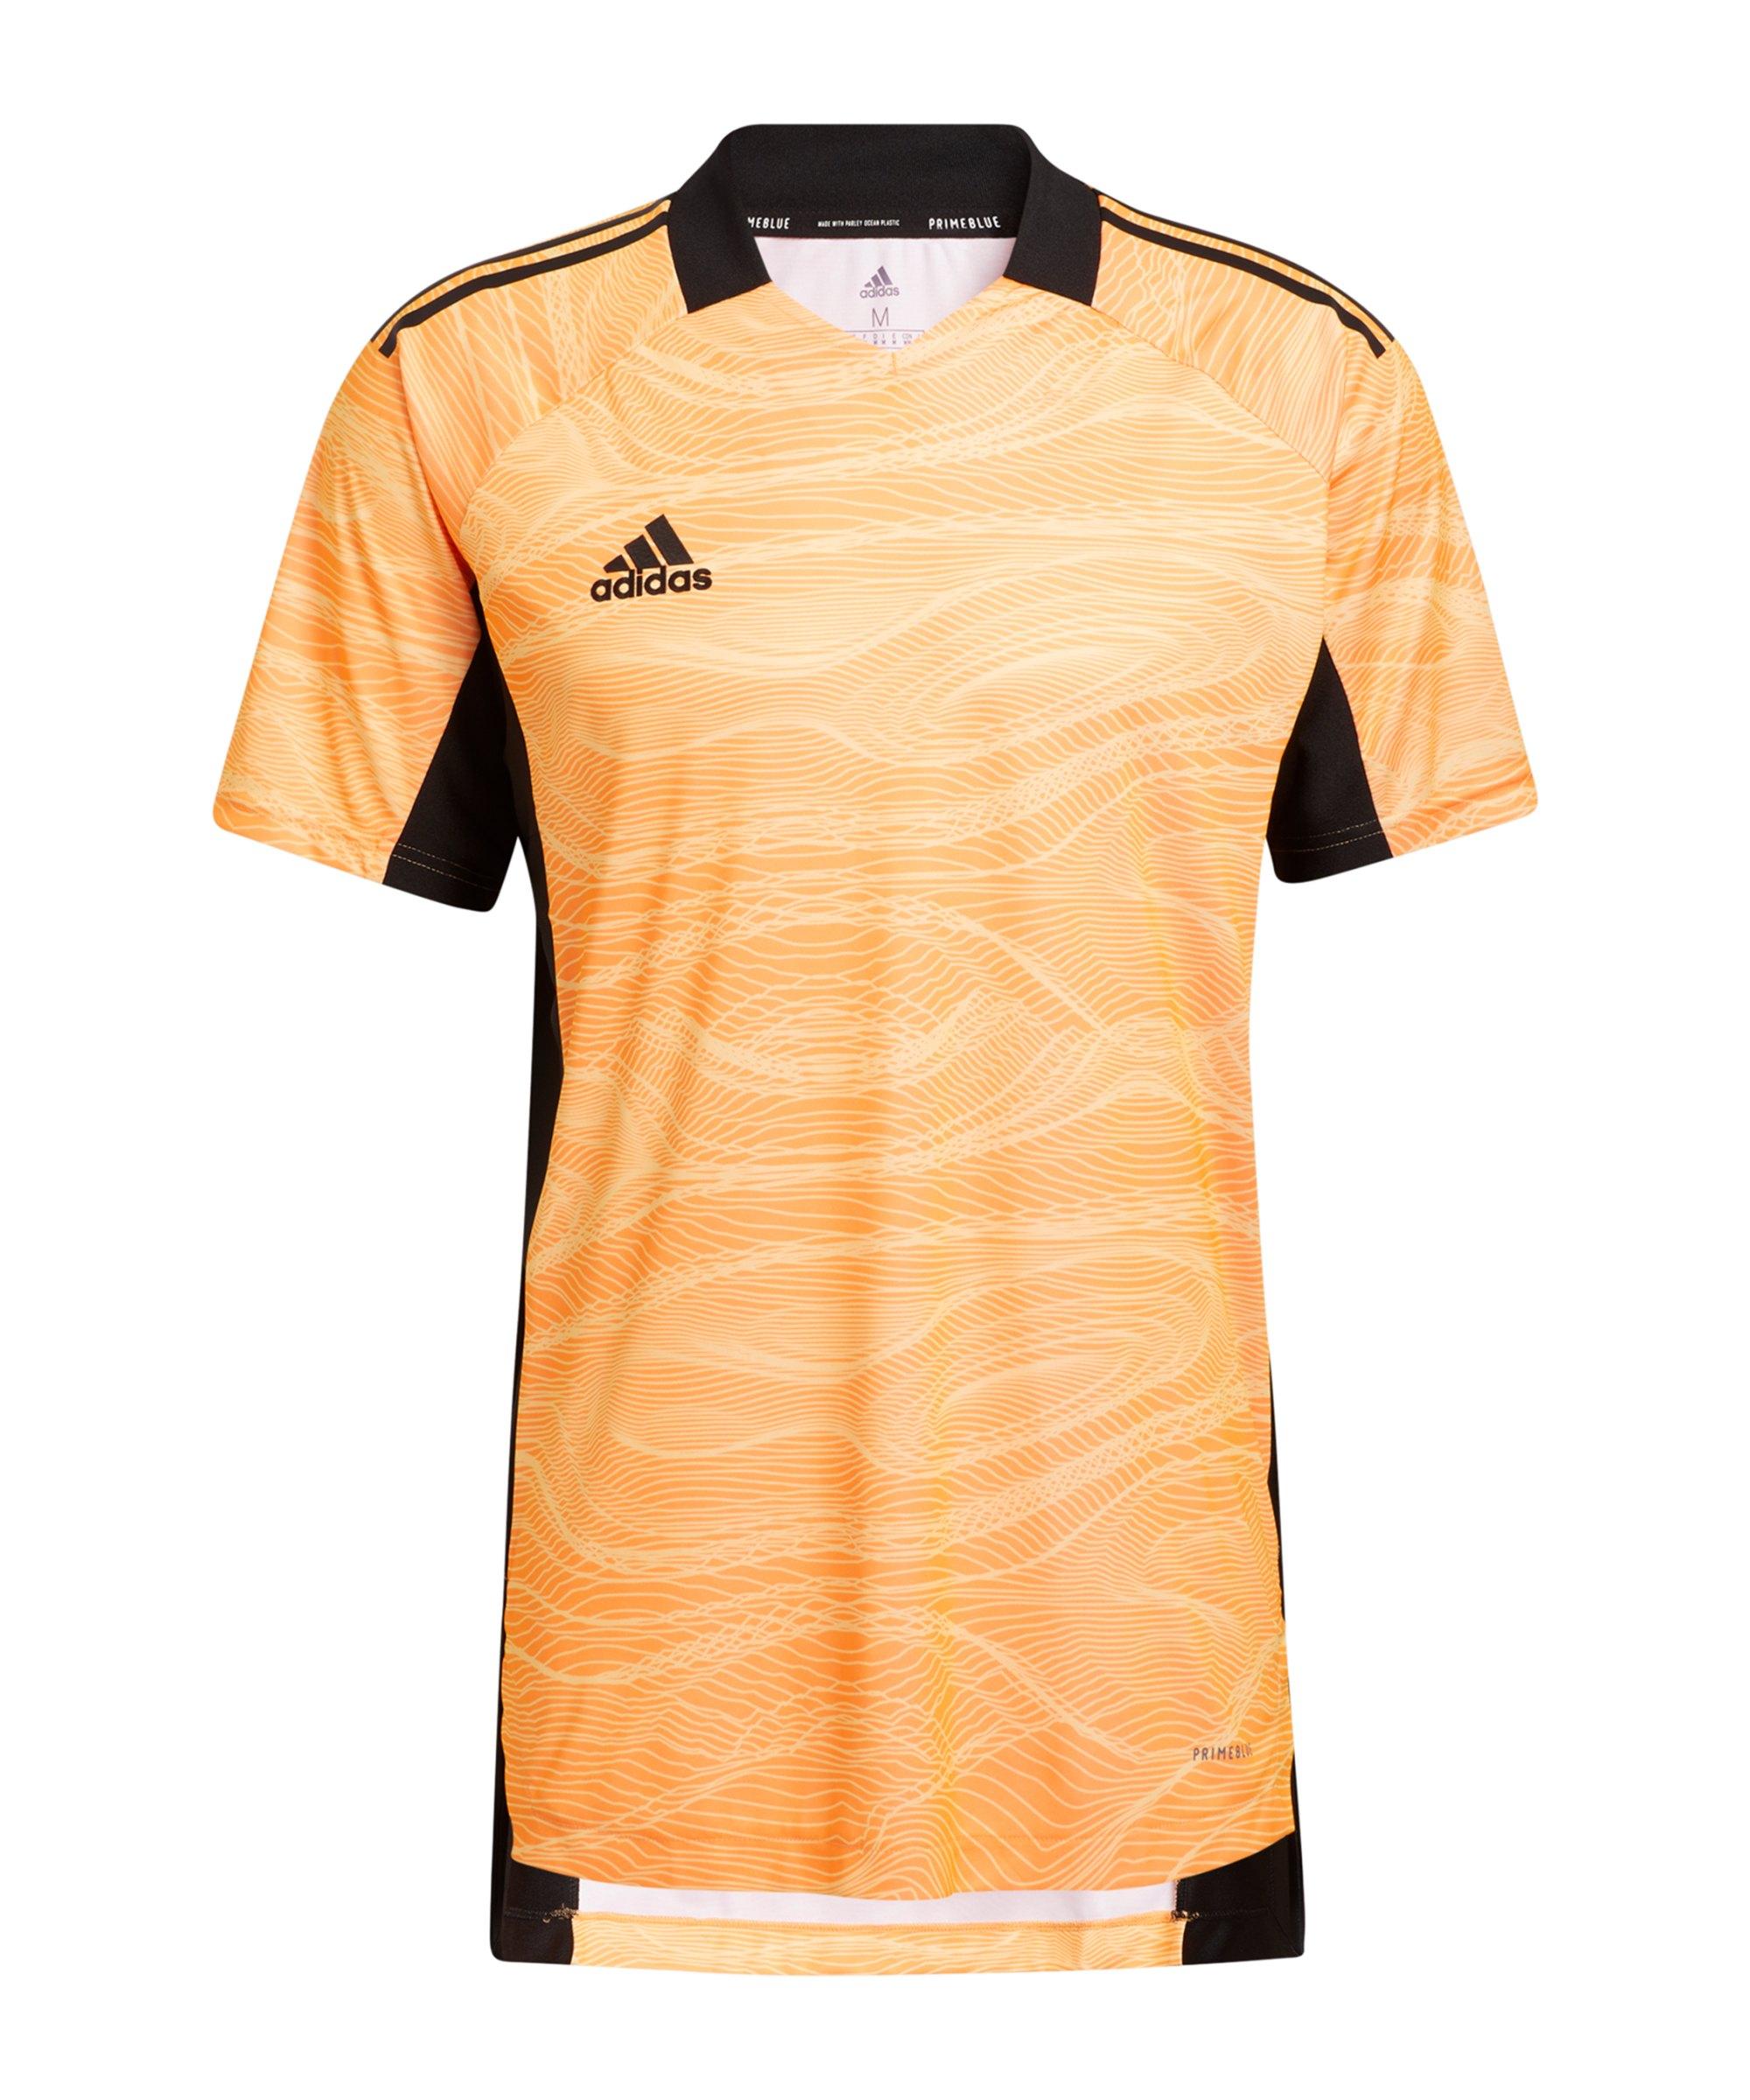 adidas Condivo 21 Torwarttrikot kurzarm Orange - orange